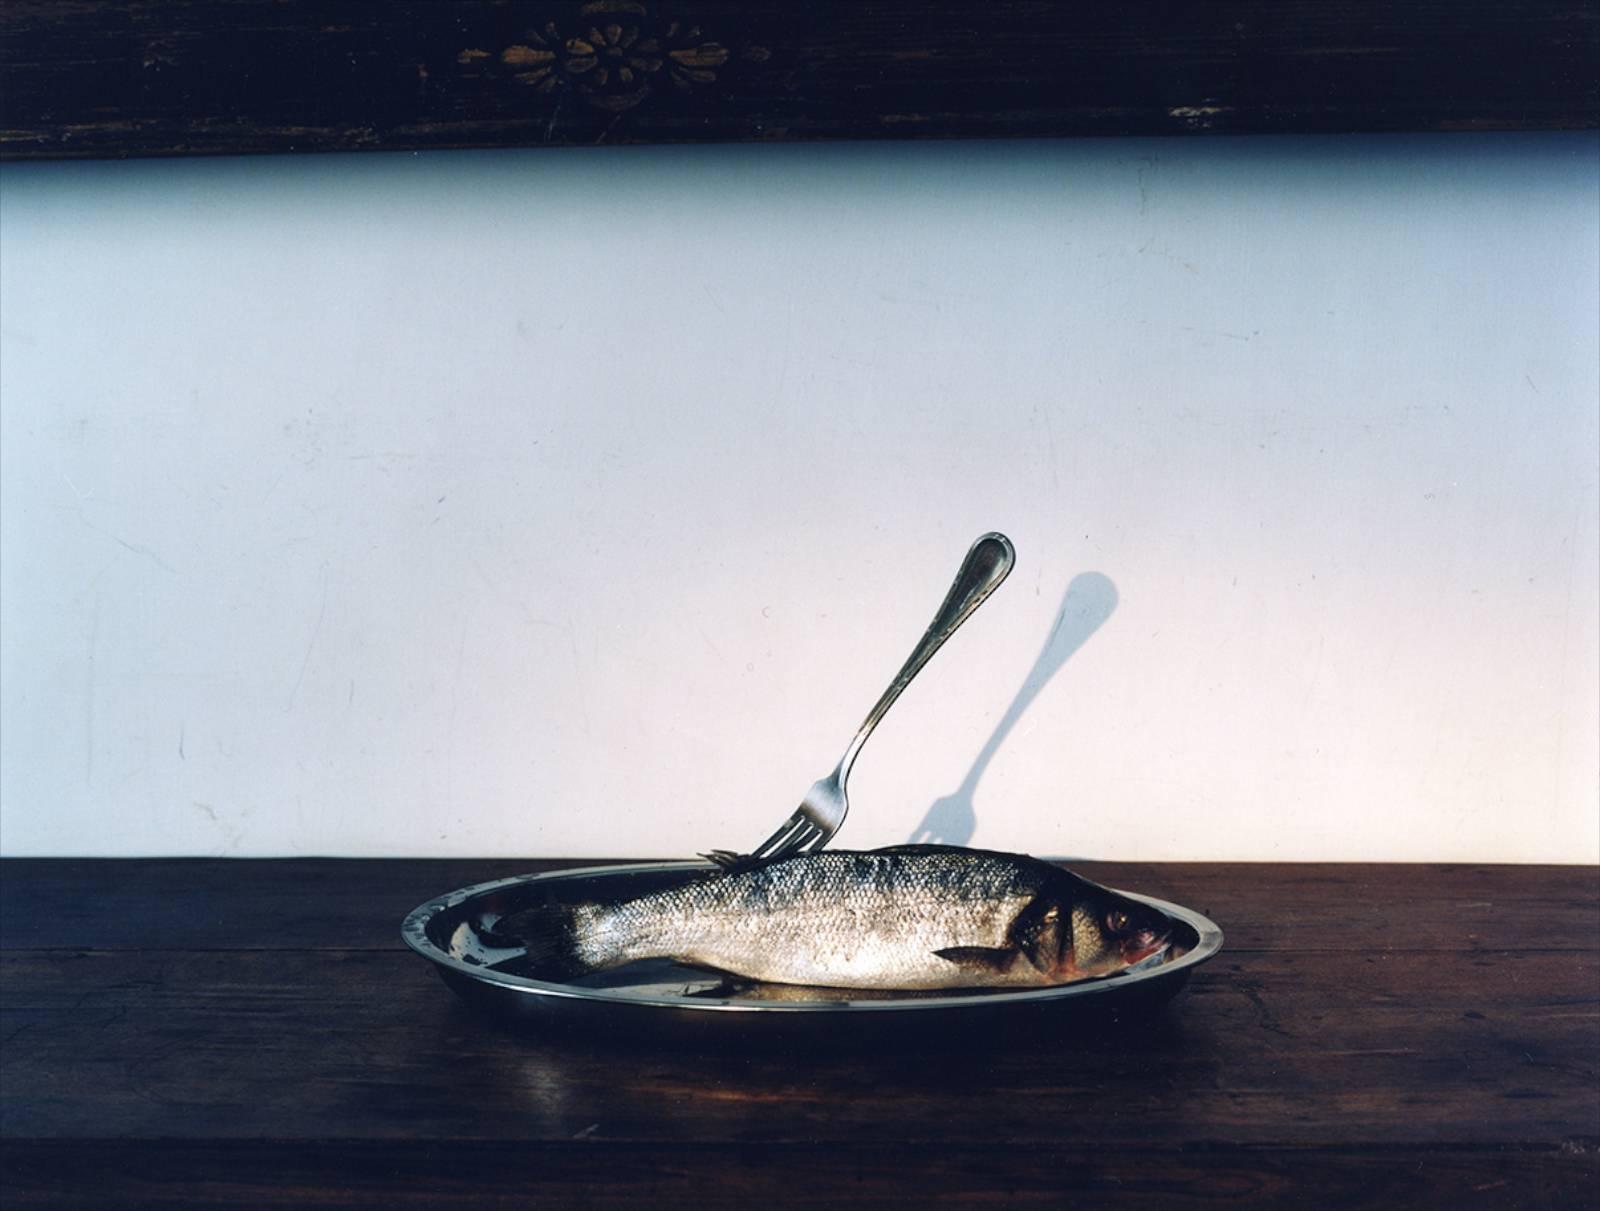 Fish, 2015, C-print, 46,5 x 60 cm